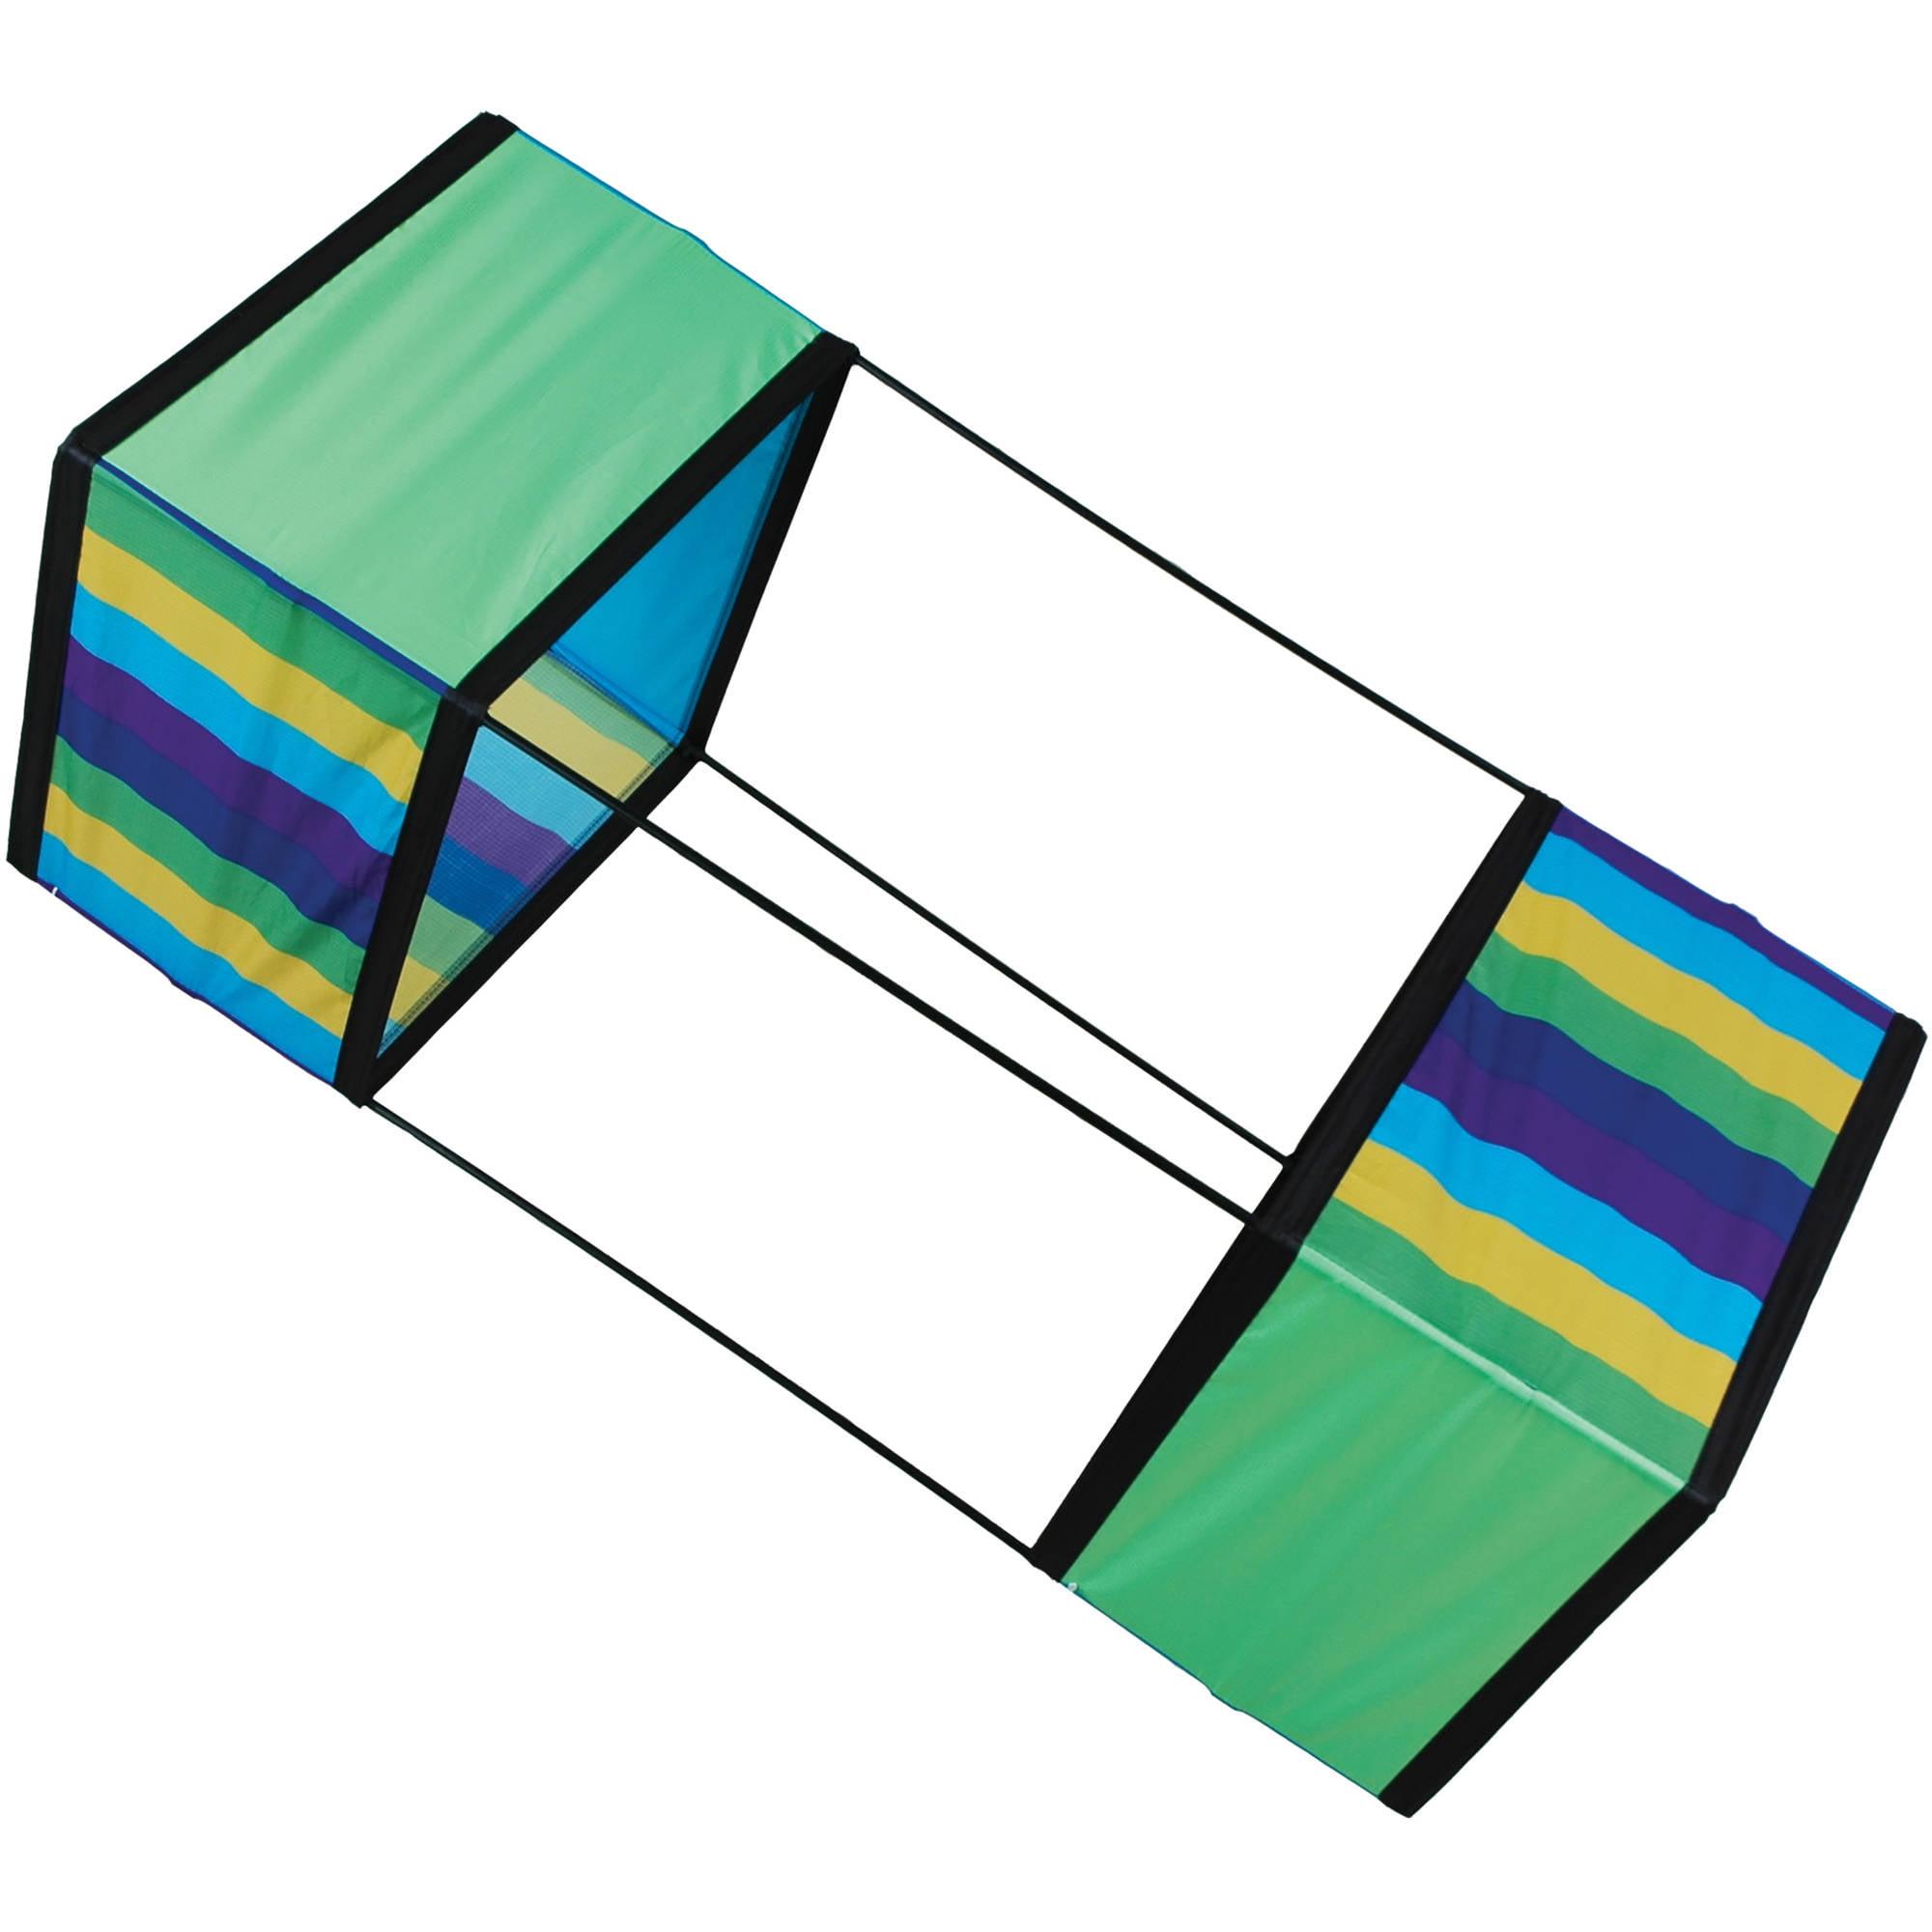 "Premier Designs 36"" Box Kite, Cabana by Premier Kite"